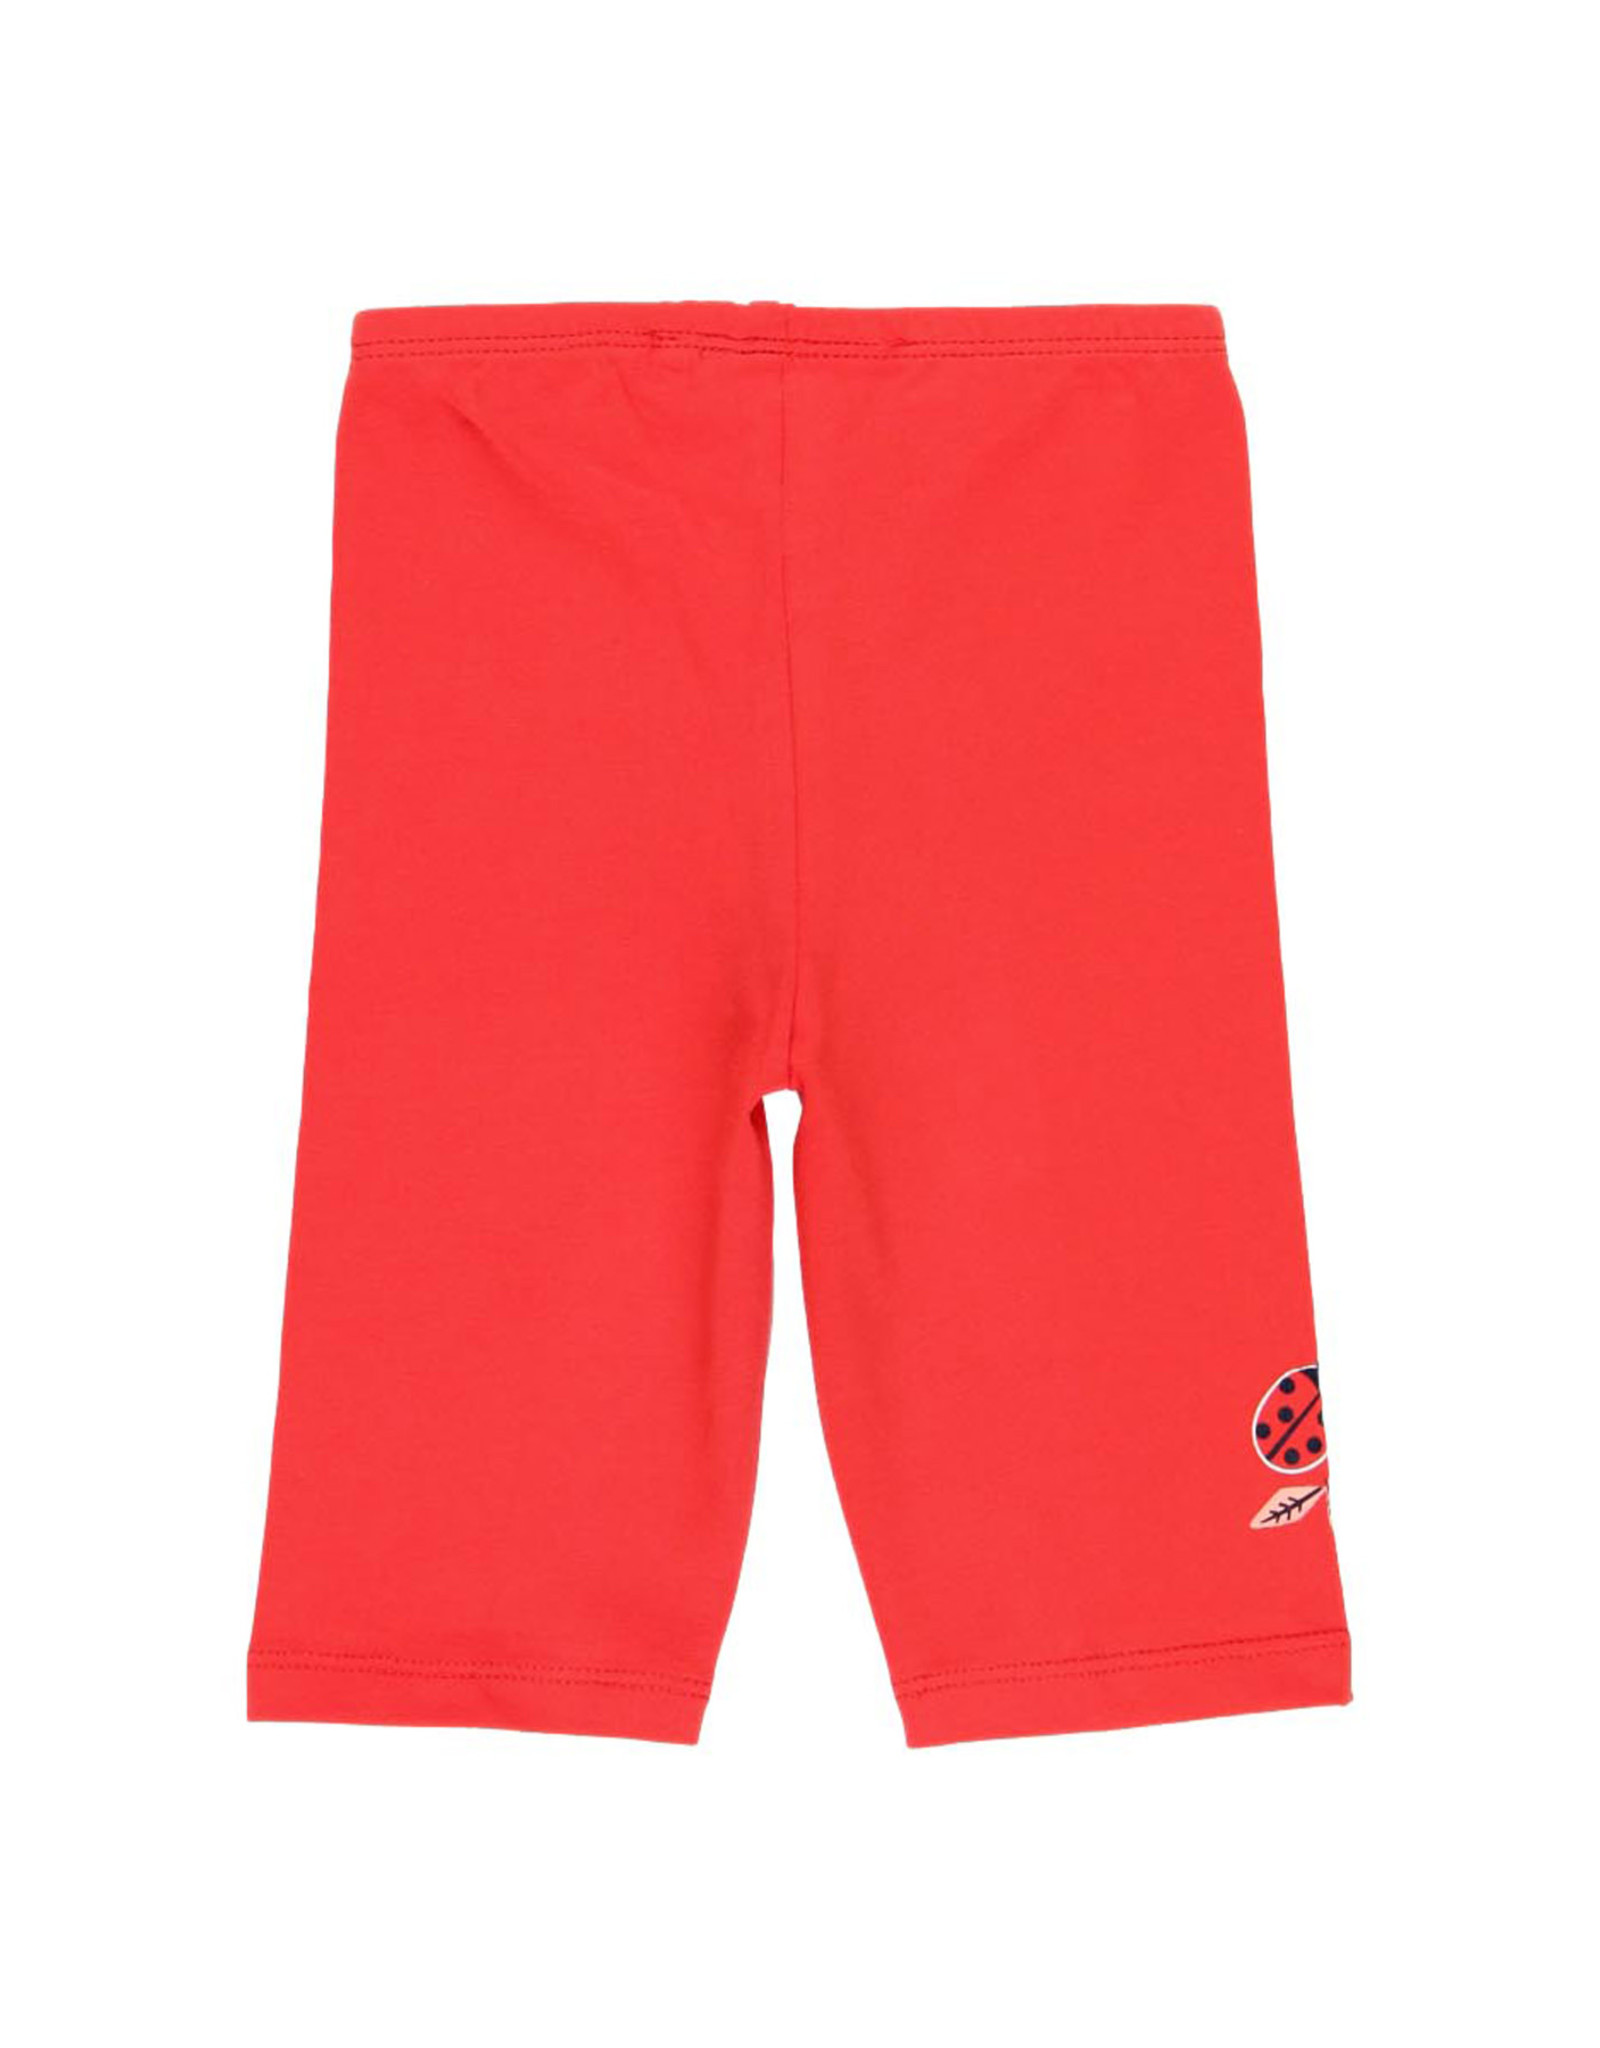 Boboli Red Capri Leggings, Ladybug Detail